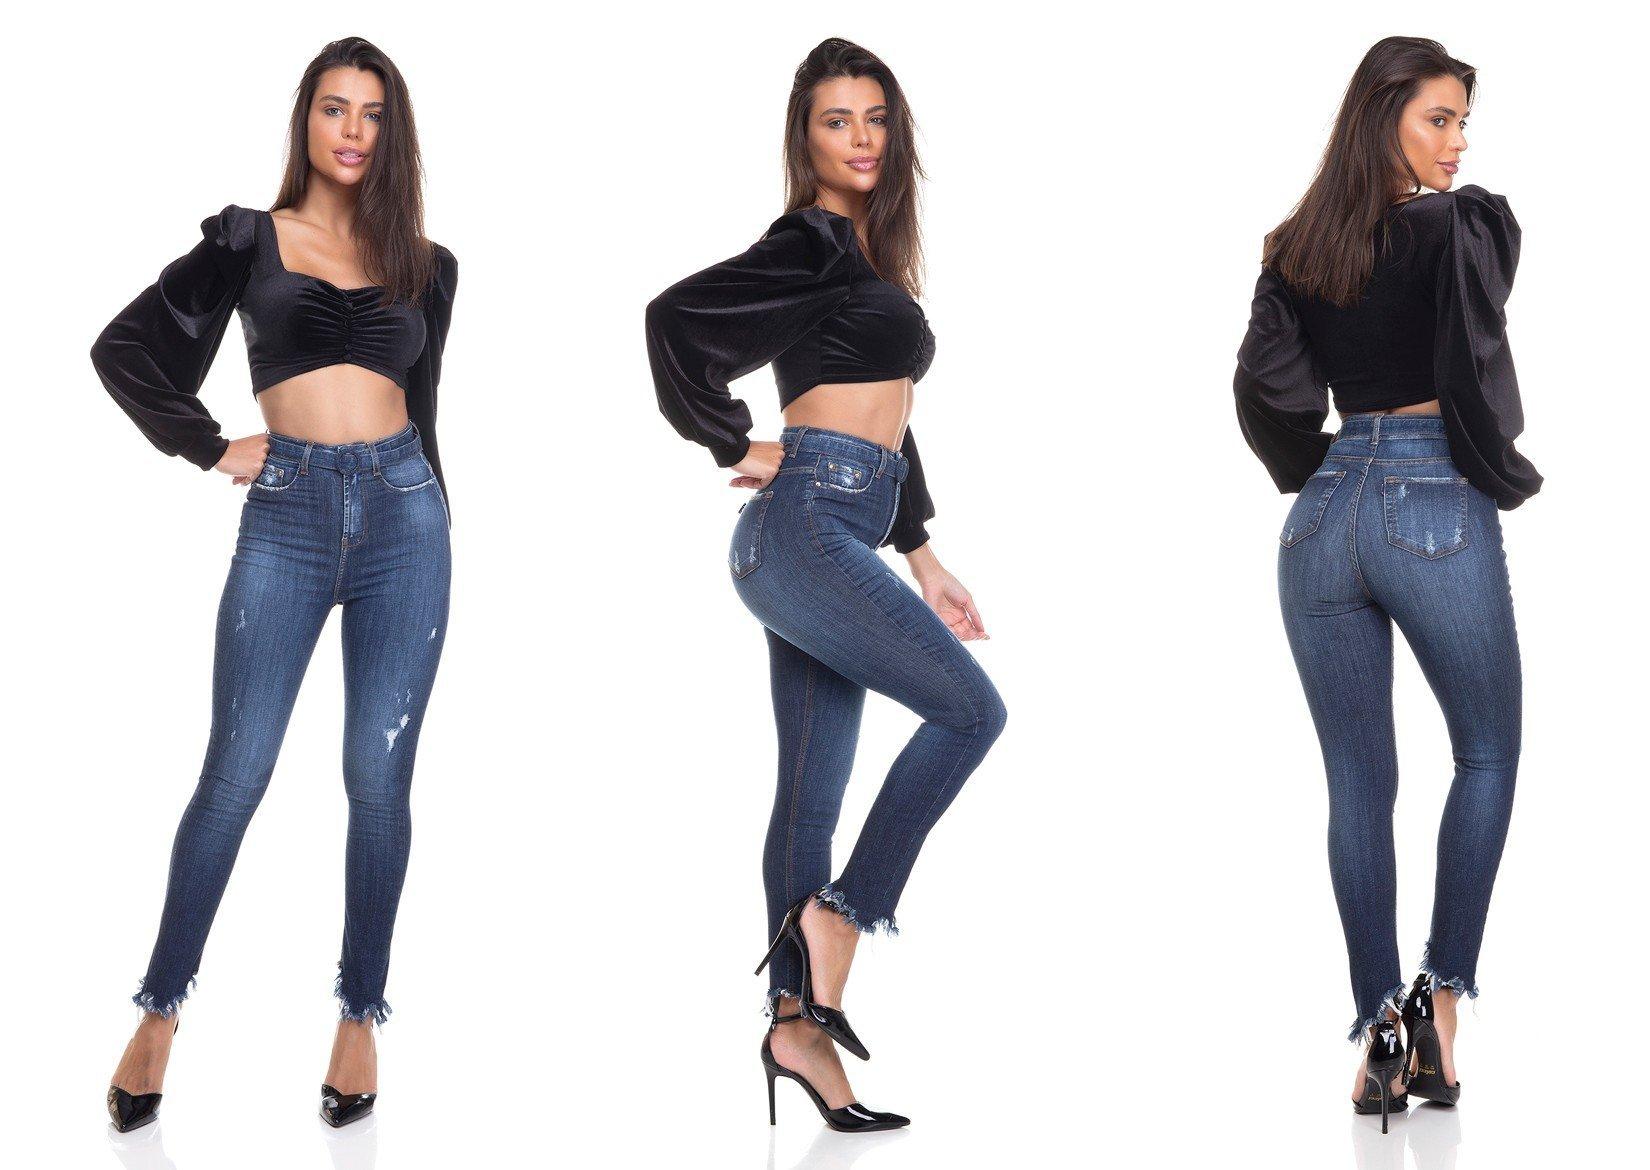 dz3363 calca jeans feminina skinny hot pants cigarrete com cinto denim zero tripla